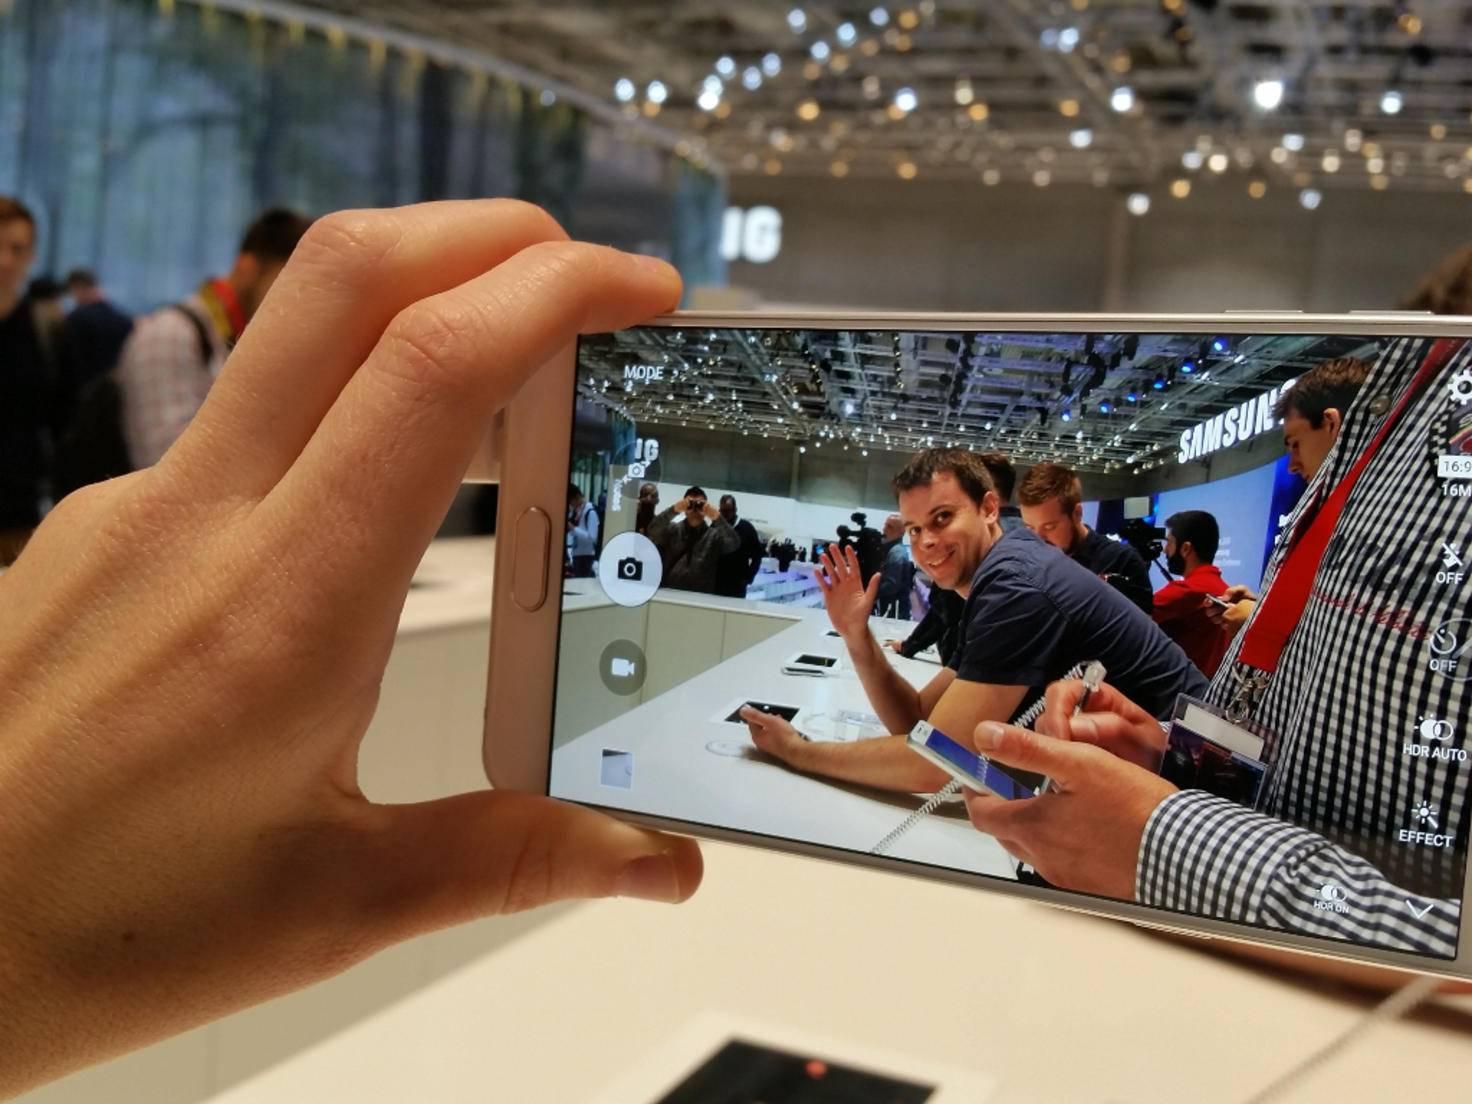 Hier winkt Patrick ins neue Galaxy Note 5.